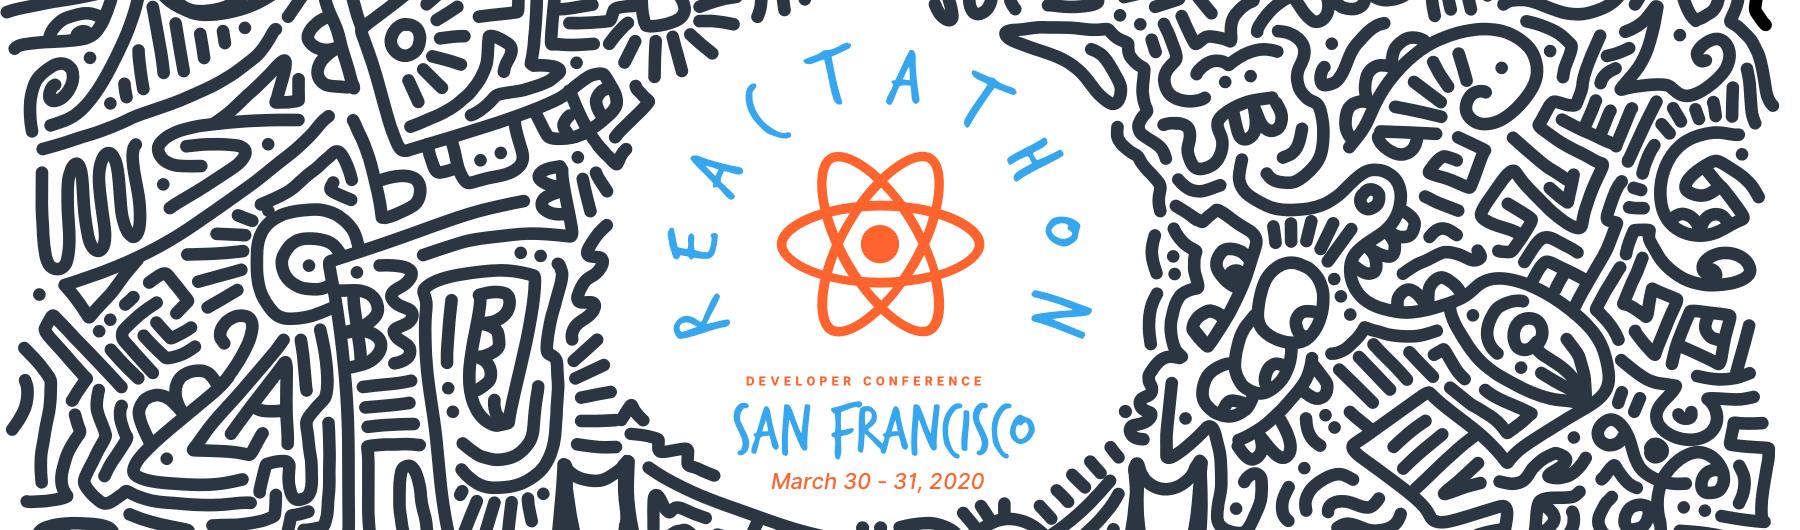 Reactathon - React Suspense Workshop